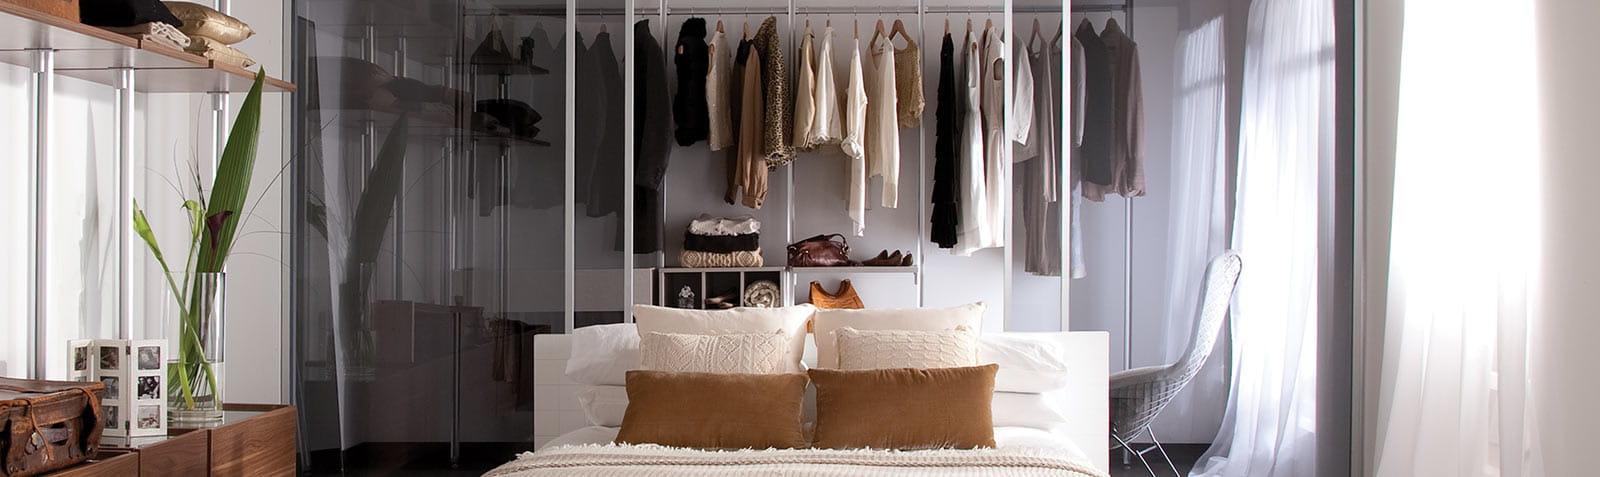 Sliding wardrobe doors in grey